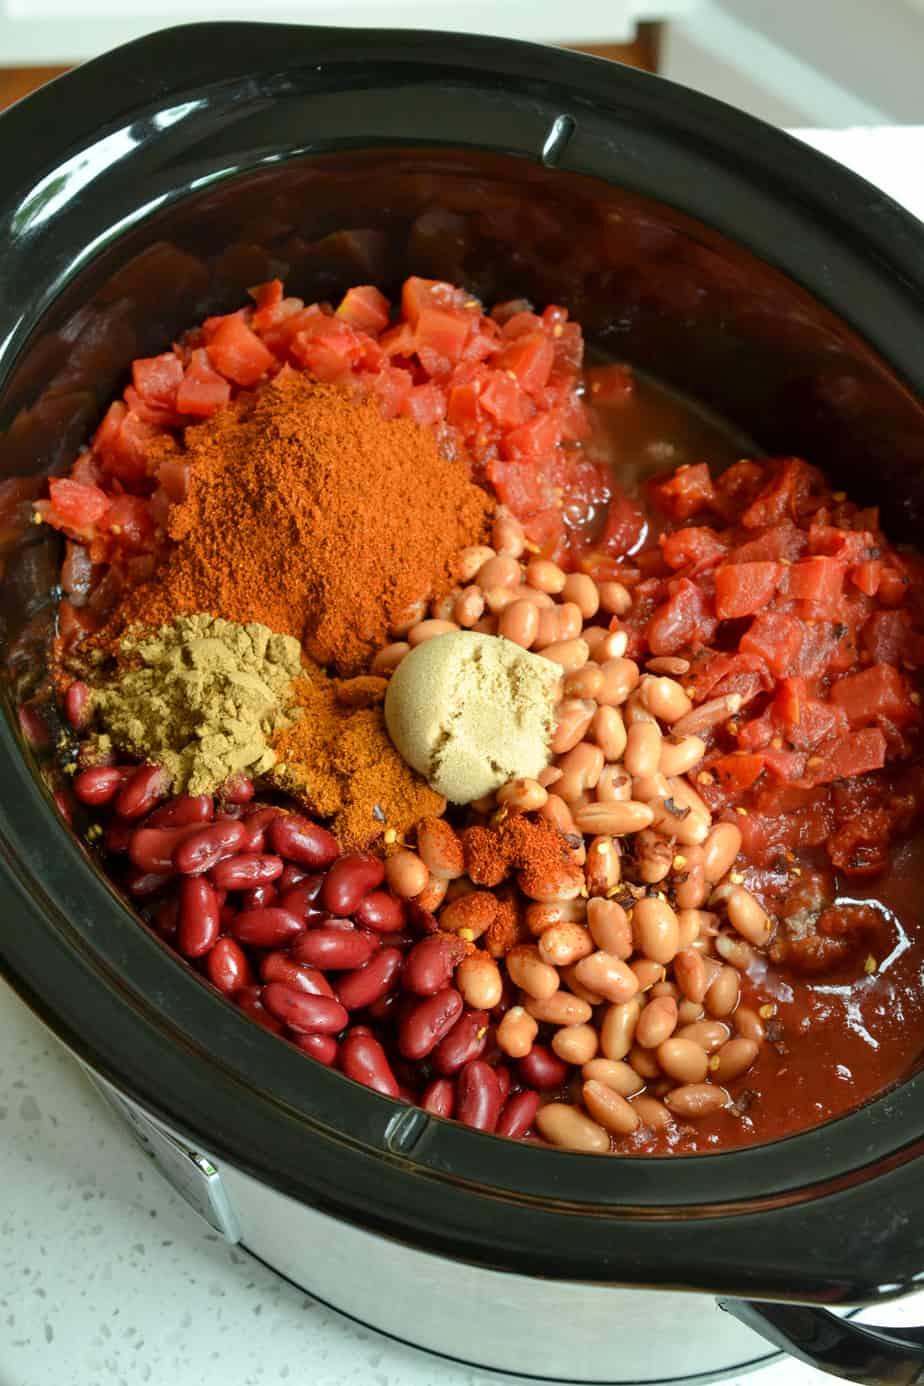 The ingredients to make Crock Pot Chili